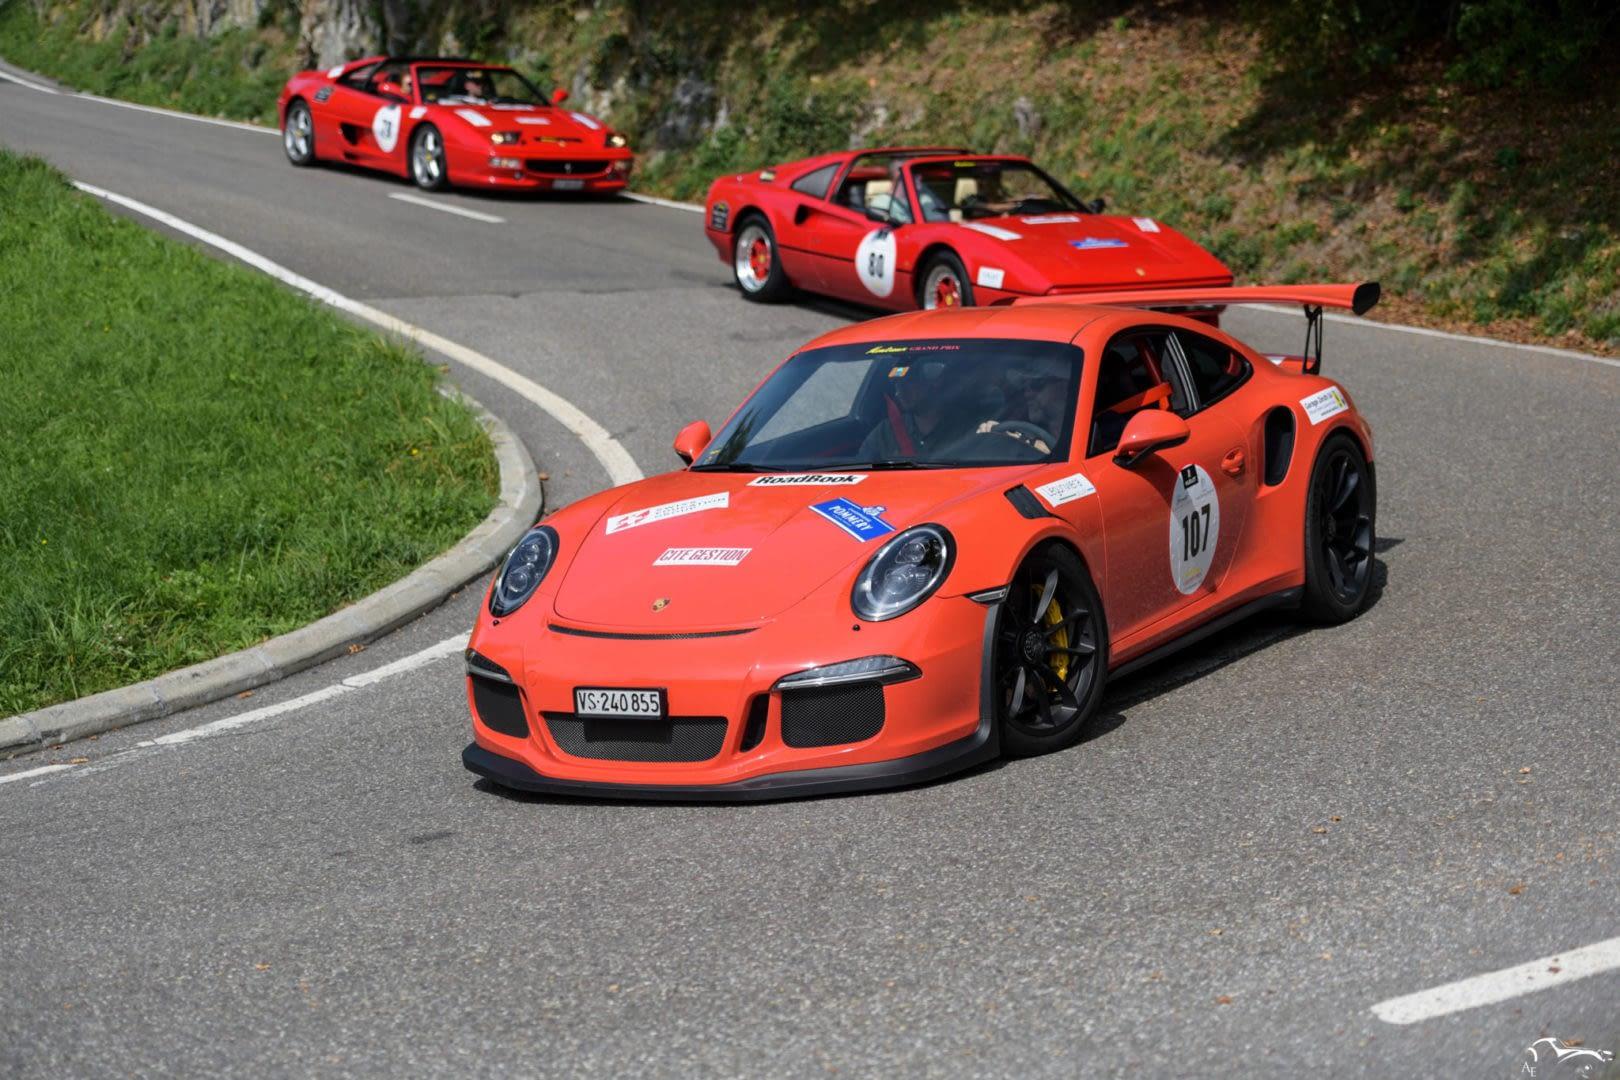 Porsche 911 GT3 RS & Ferrari 328 GTS & Ferrari F1 355